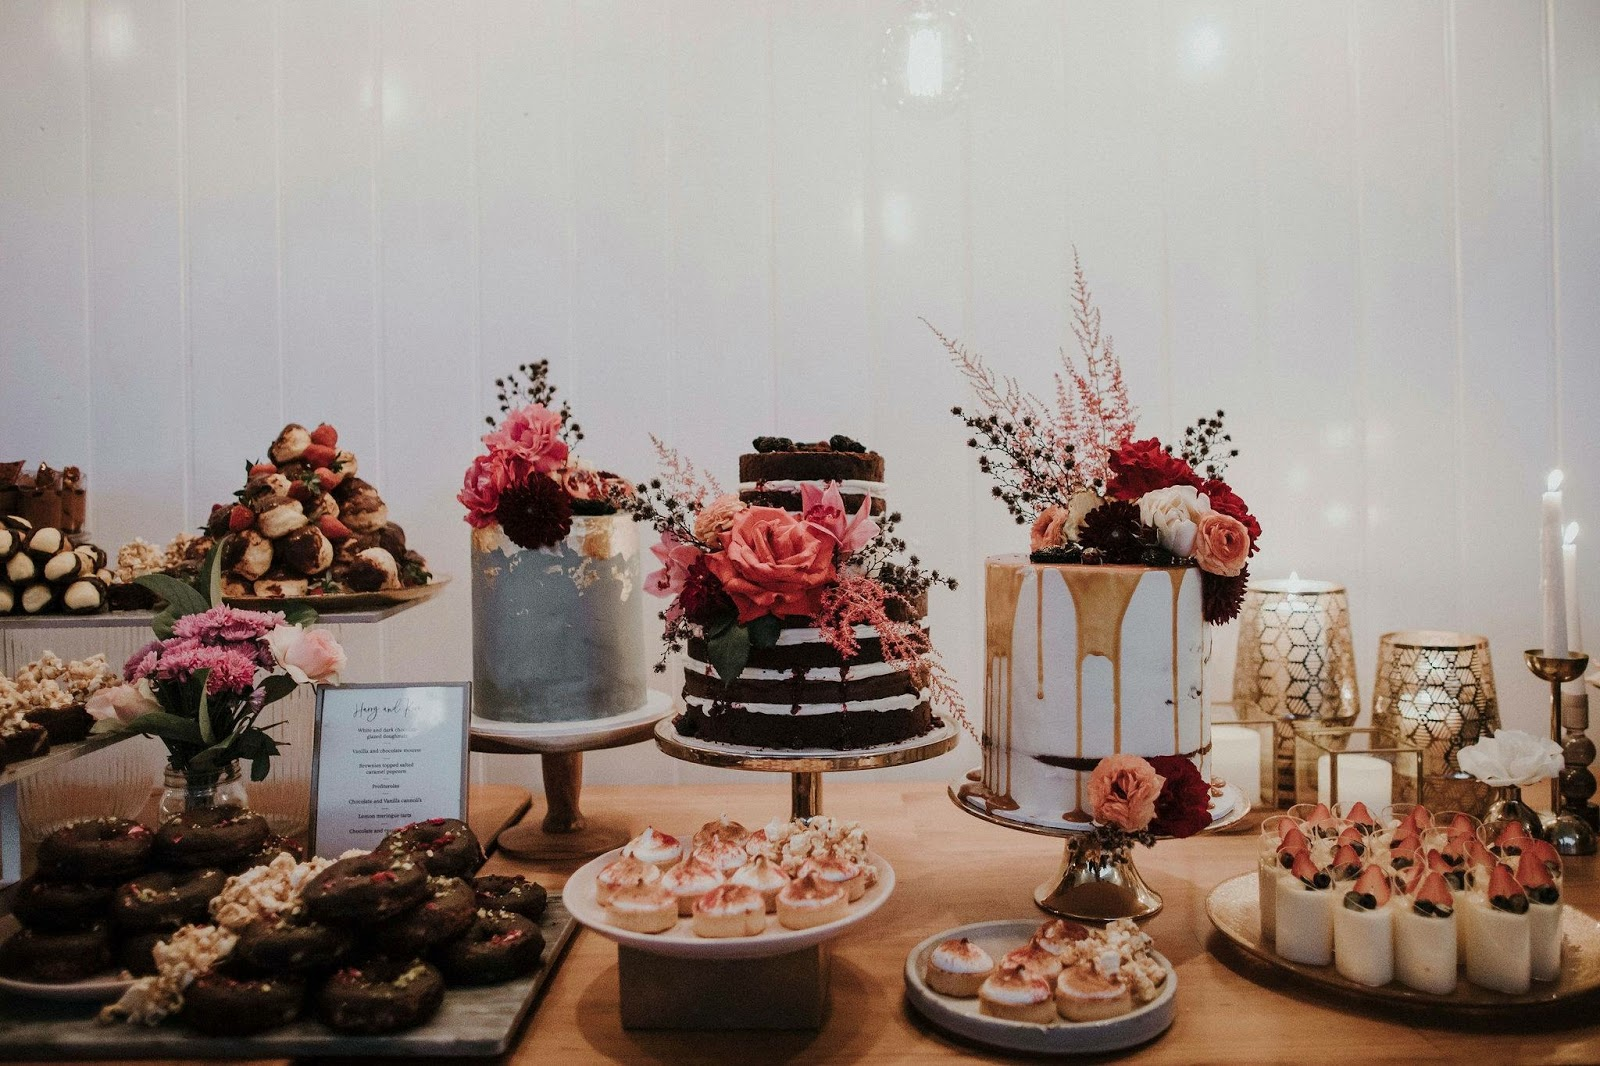 melbourne wedding cakes dessert designer cake weddings flossy photos